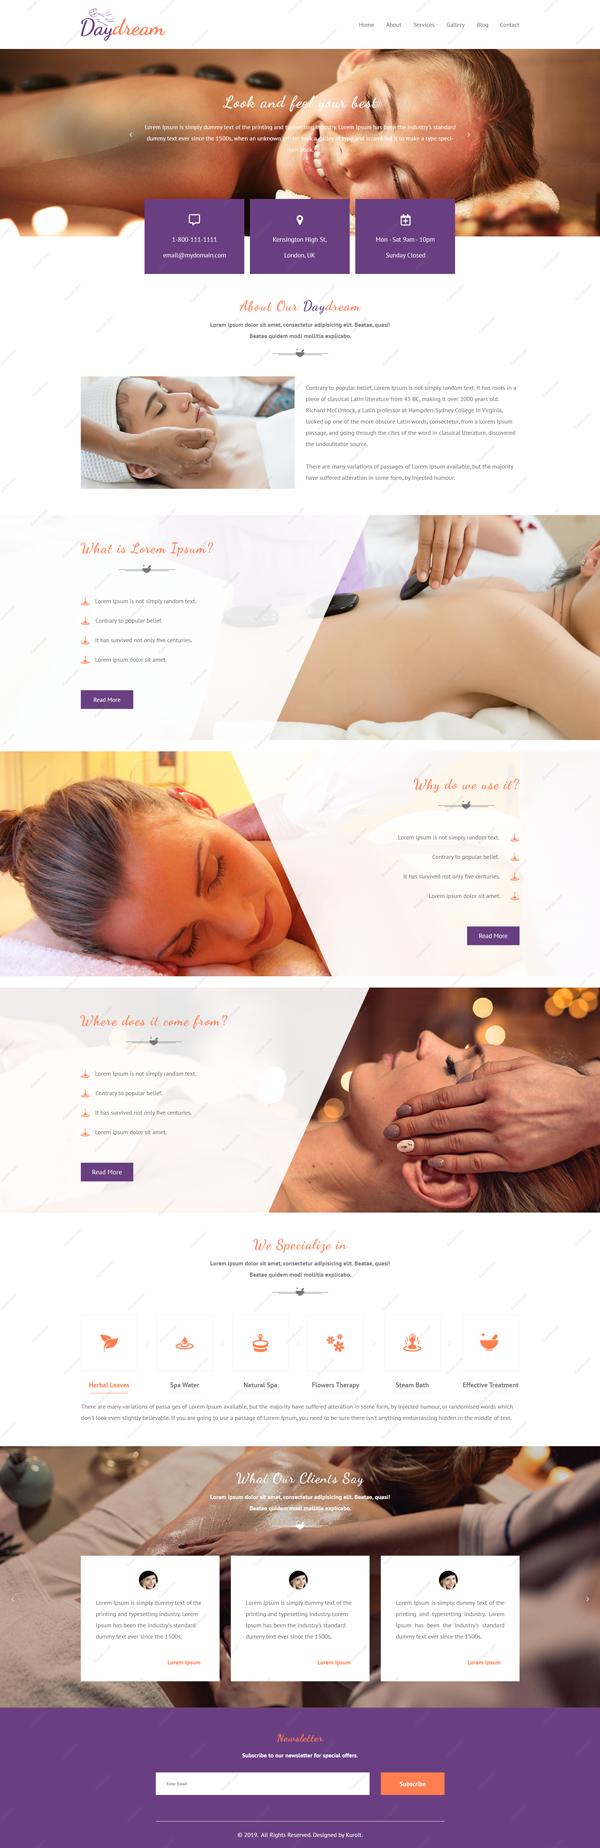 Website design for daydream